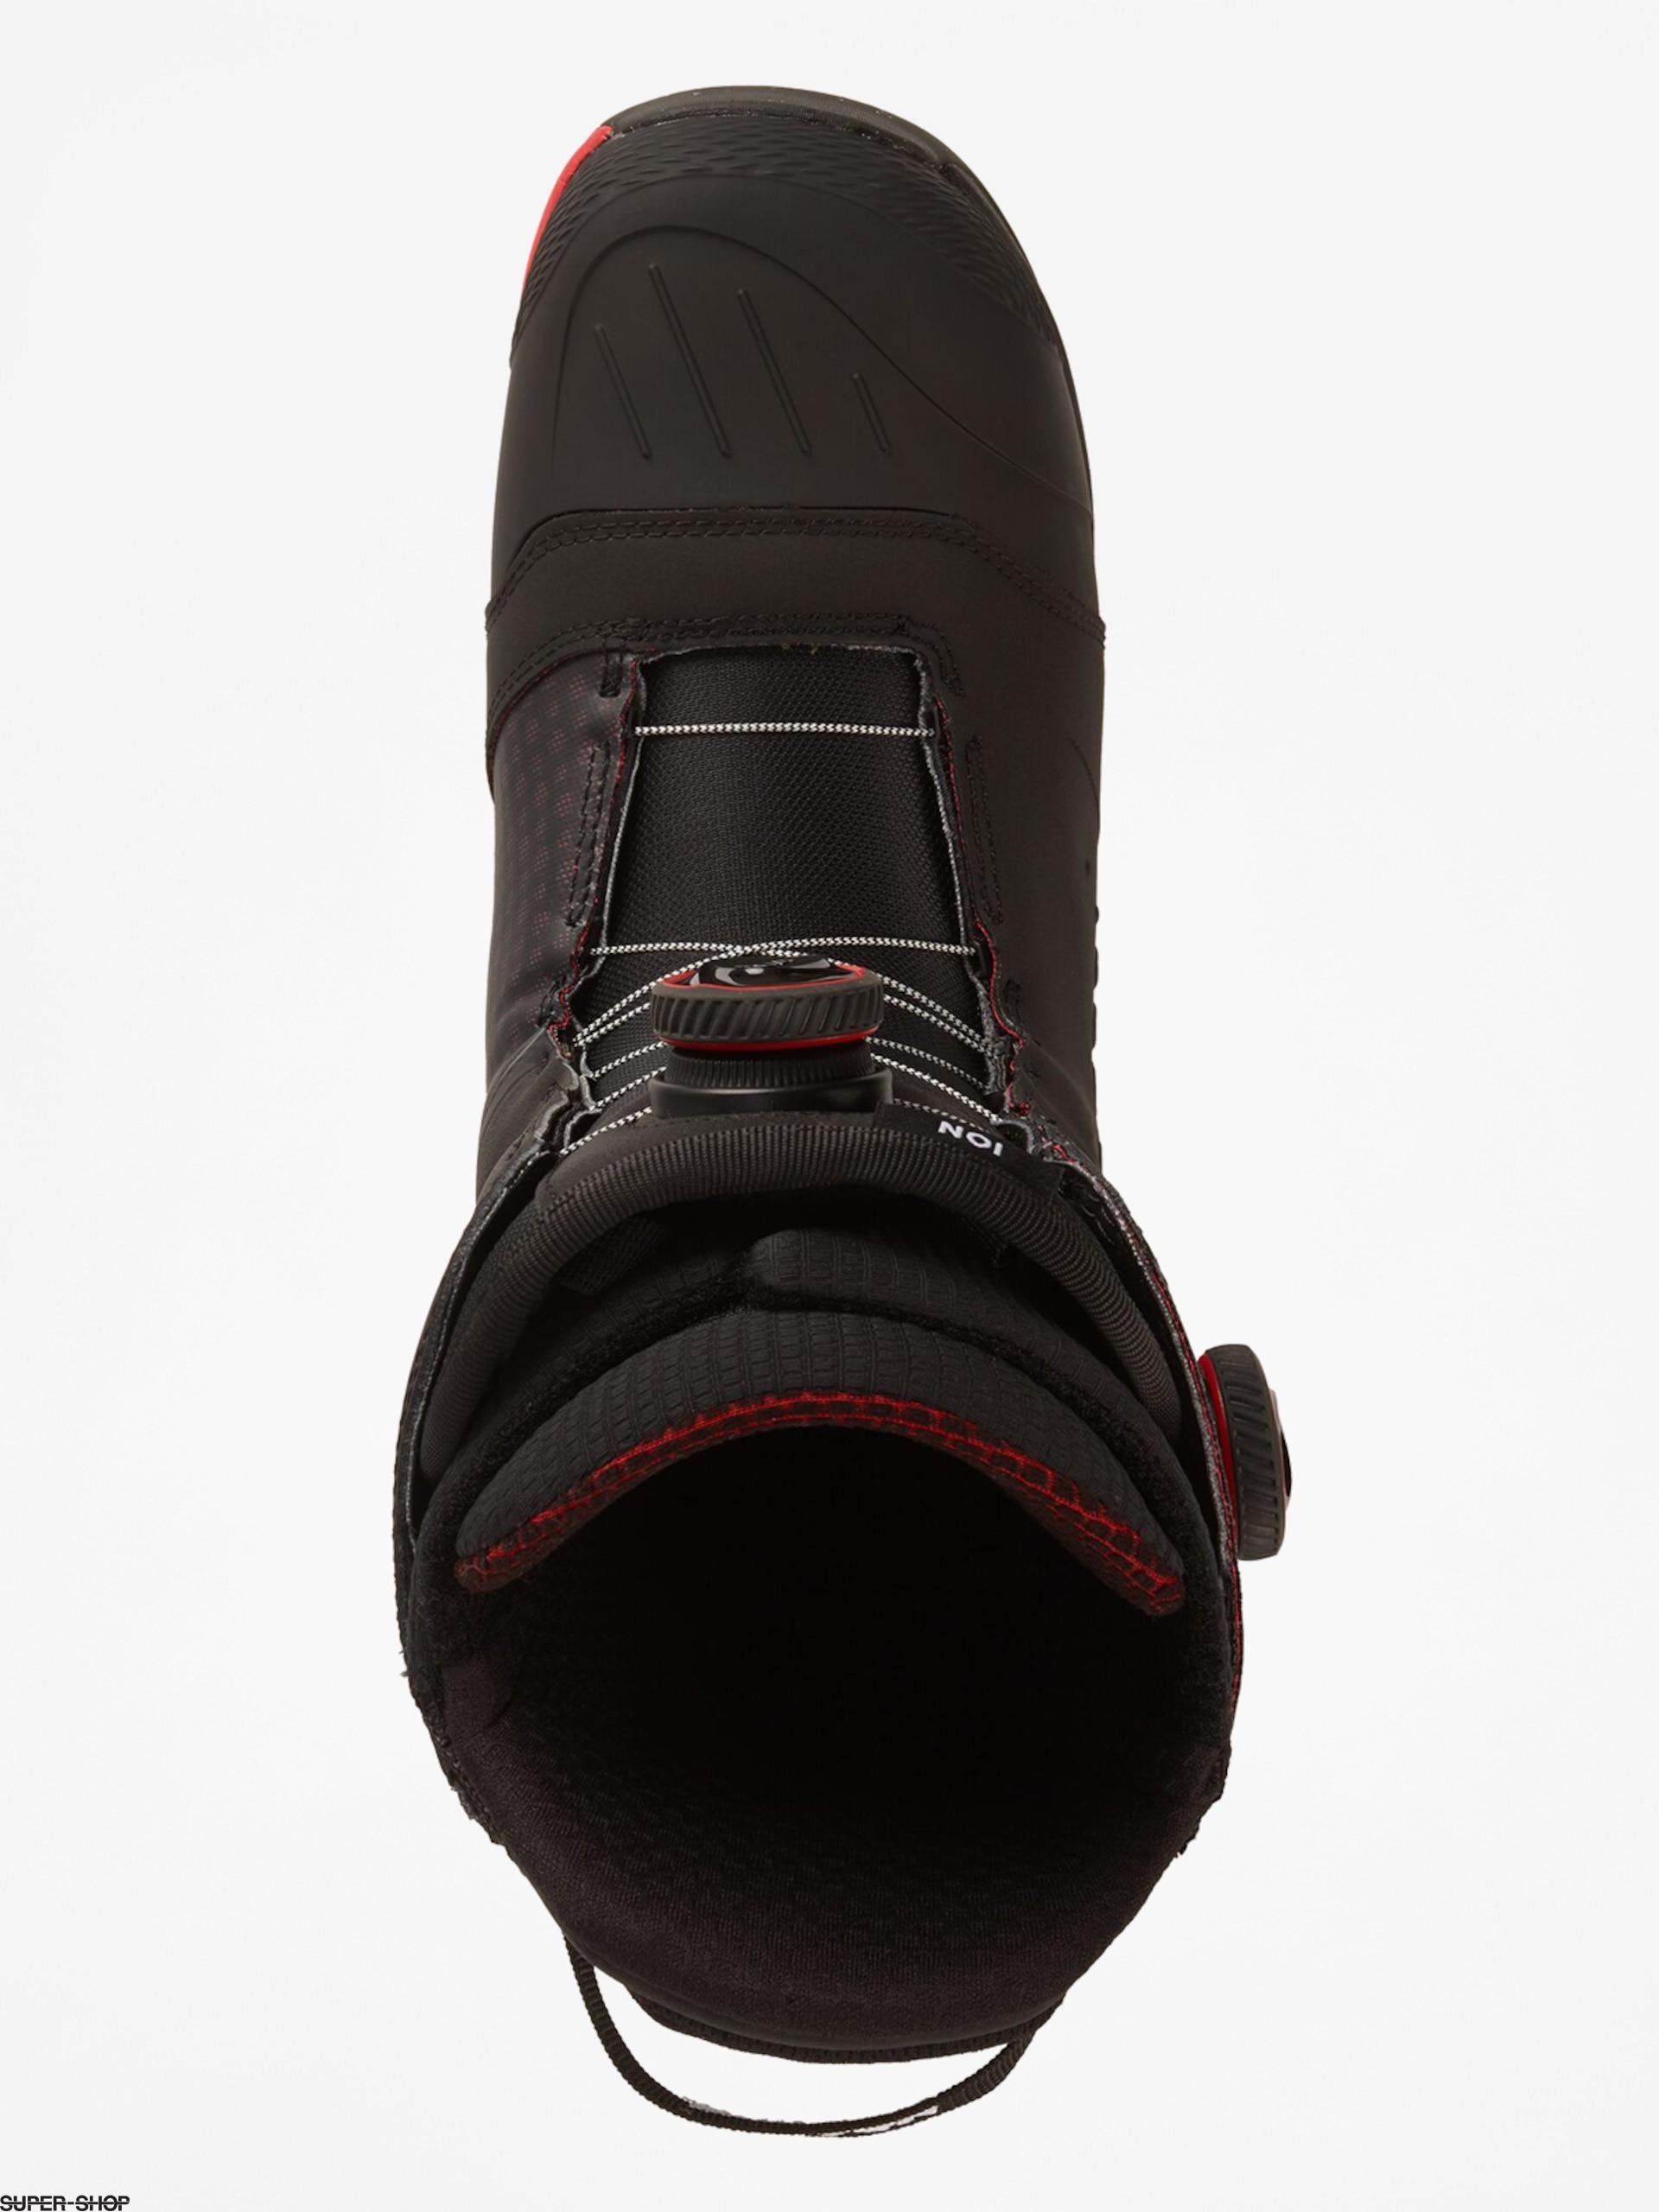 2020 Burton Ion Mens Black//Red Snowboard Boots